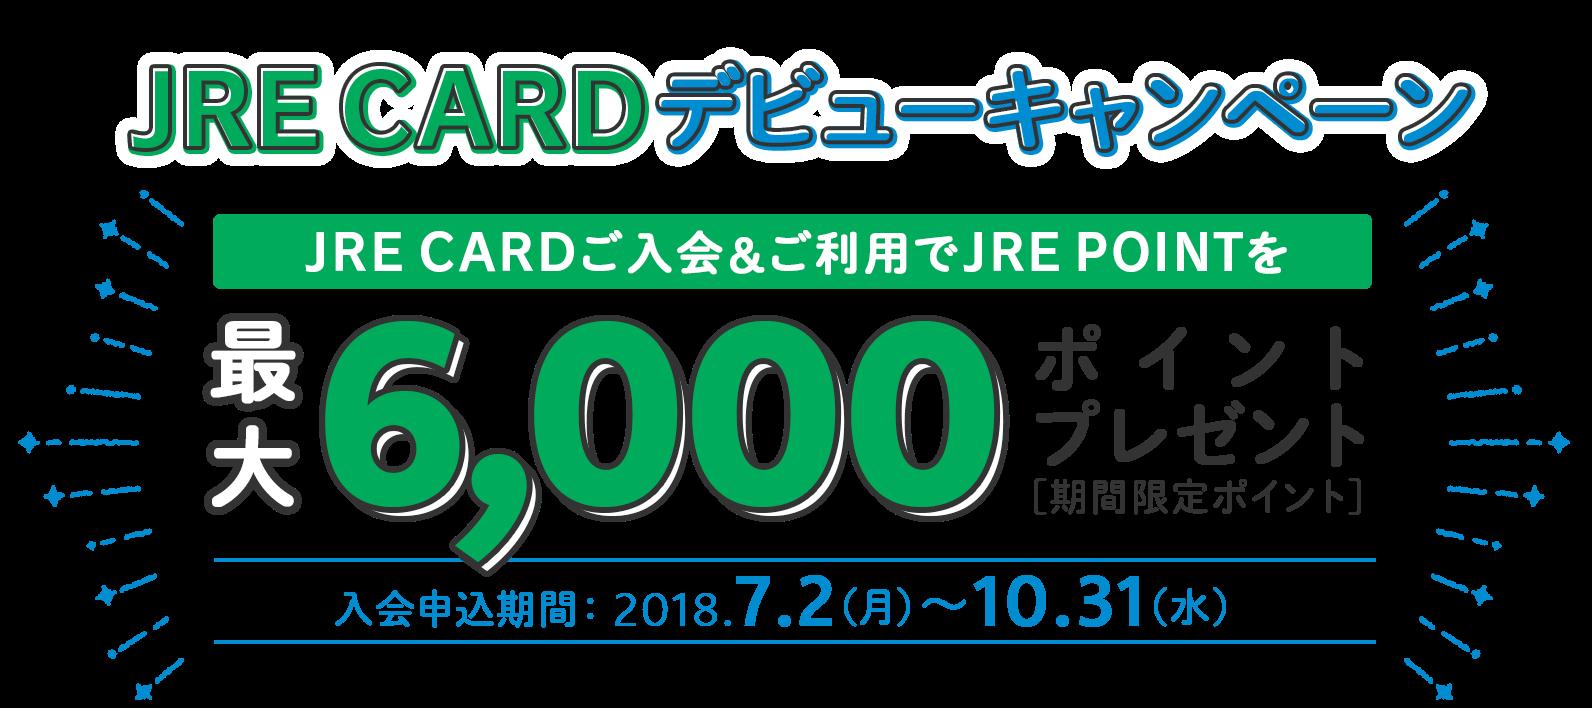 JRE CARDデビューキャンペーン!JRE CARDご入会&ご利用でJRE POINTを最大6,000ポイントプレゼント[期間限定ポイント]入会申込期間:2018.7.2(月)〜10.31(水)